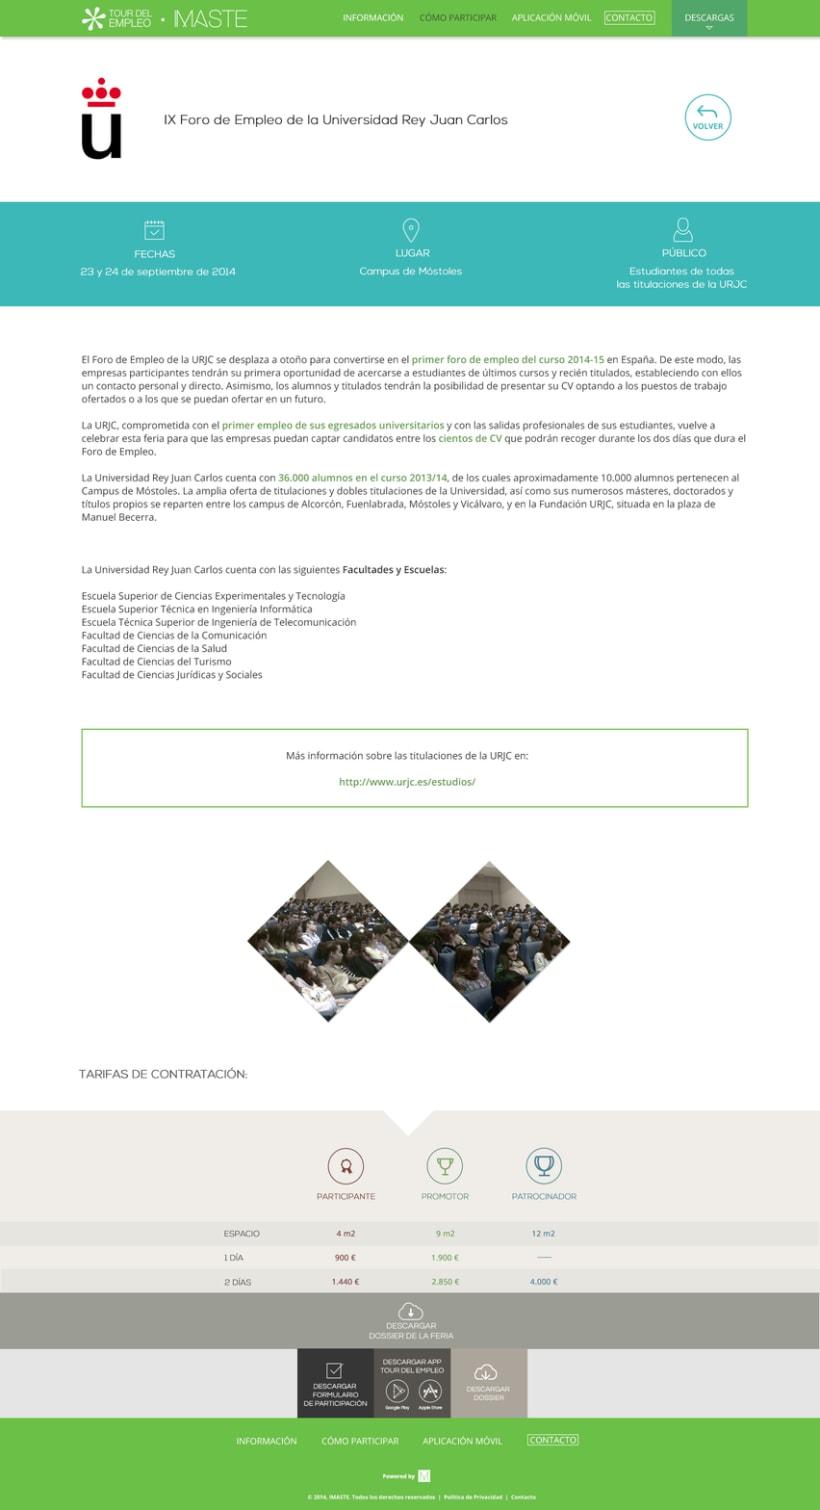 Web design & development for job fair sites 9